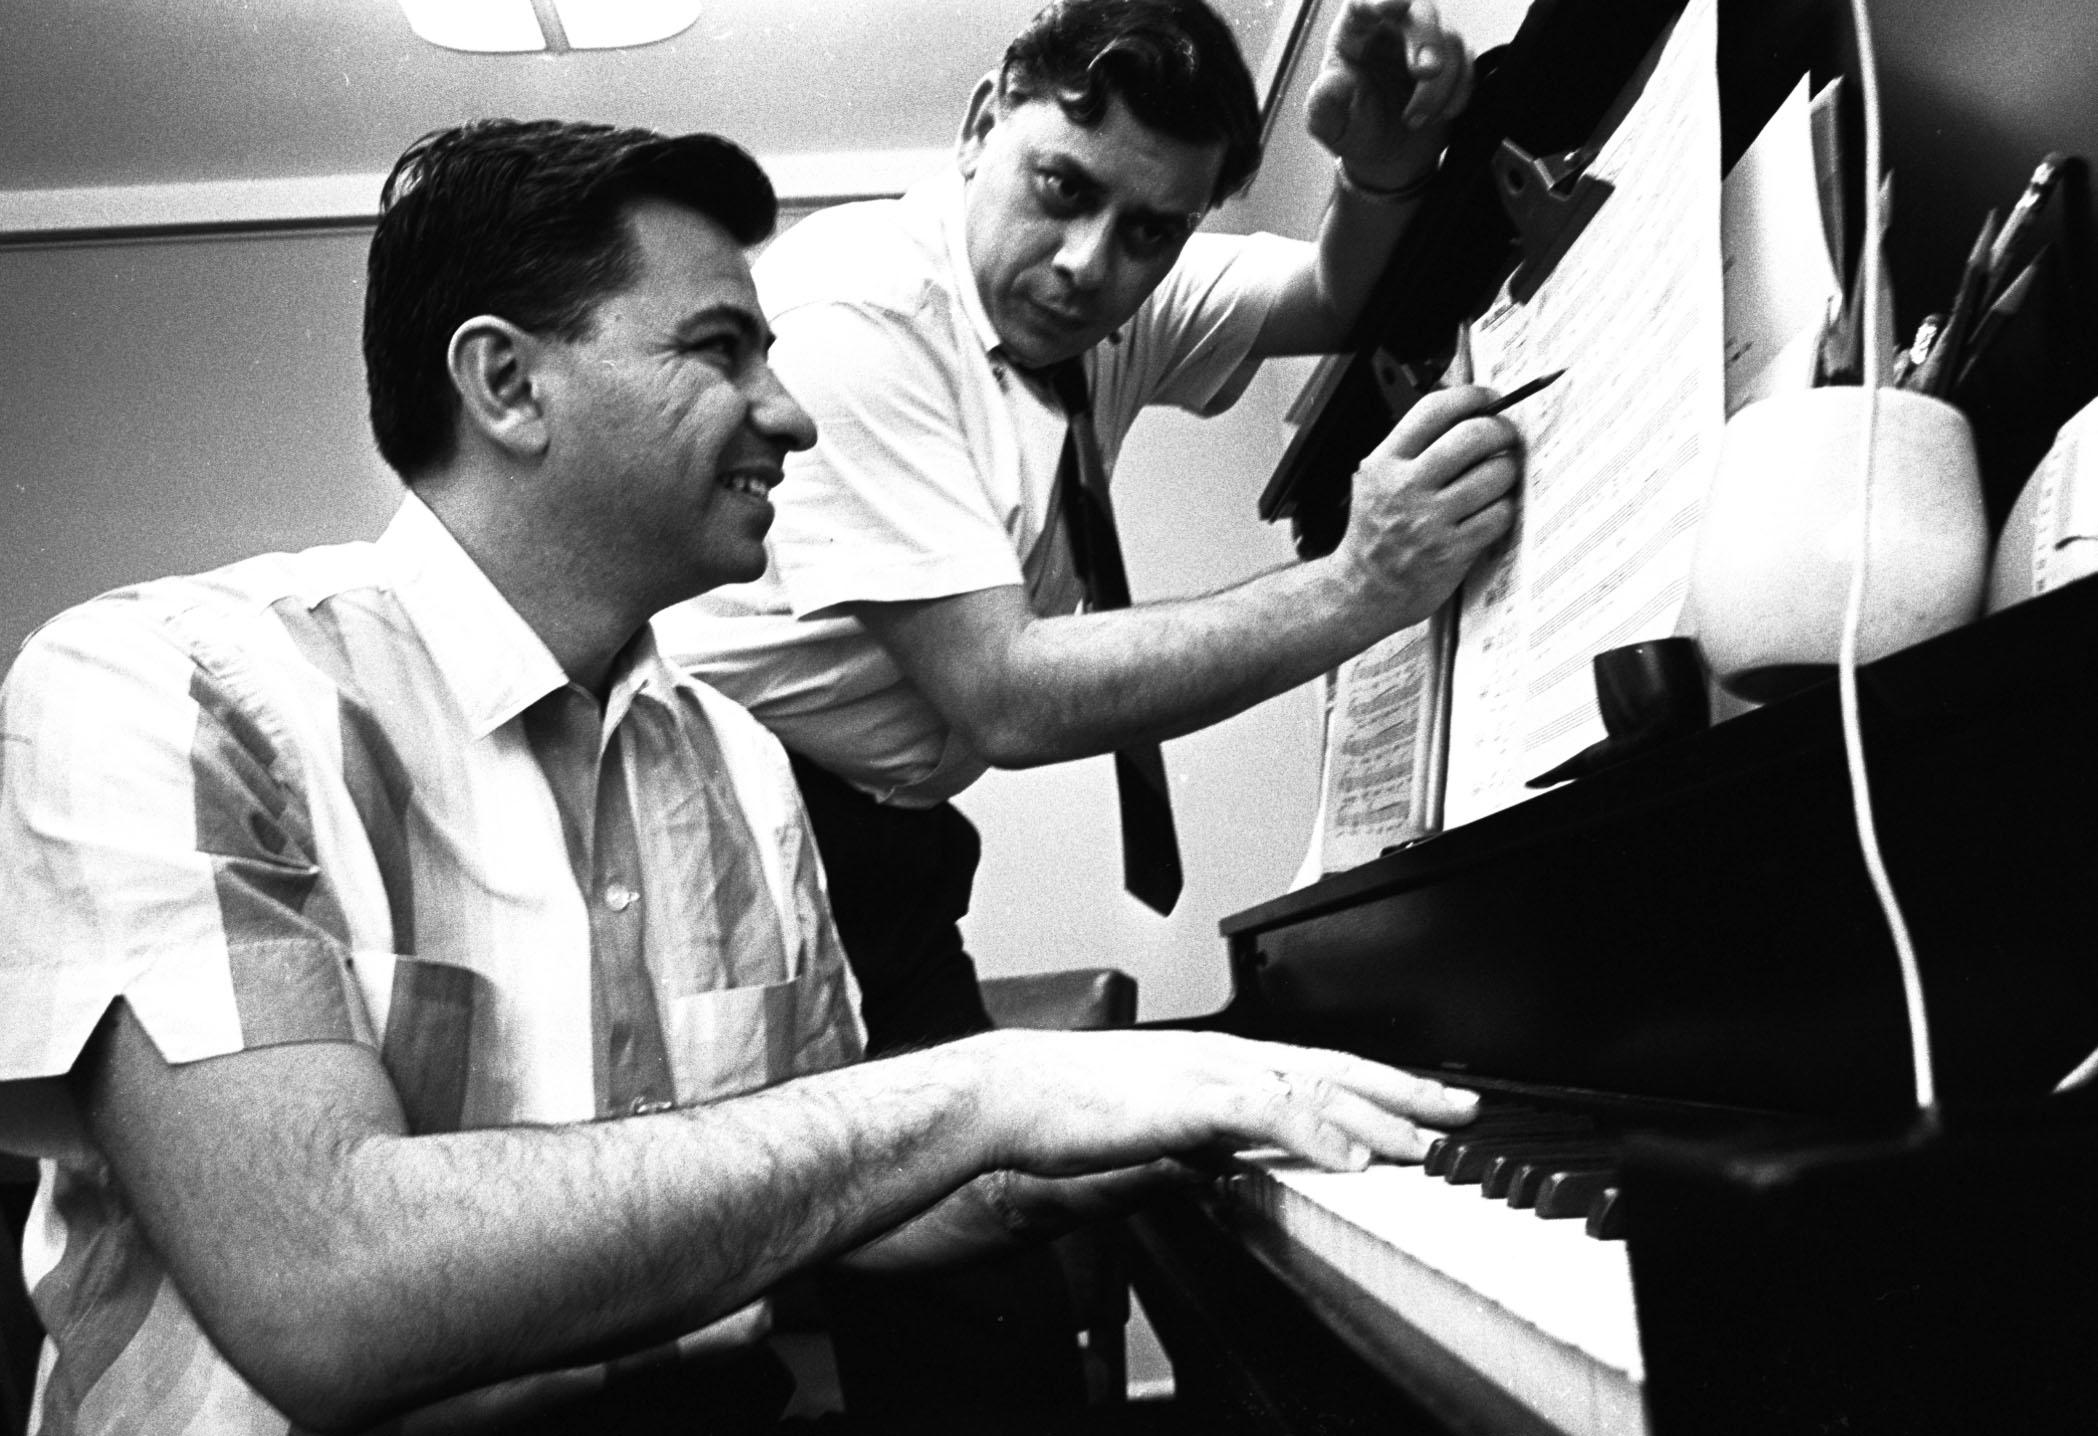 I fratelli Sherman – i canzonieri del Regno Disney